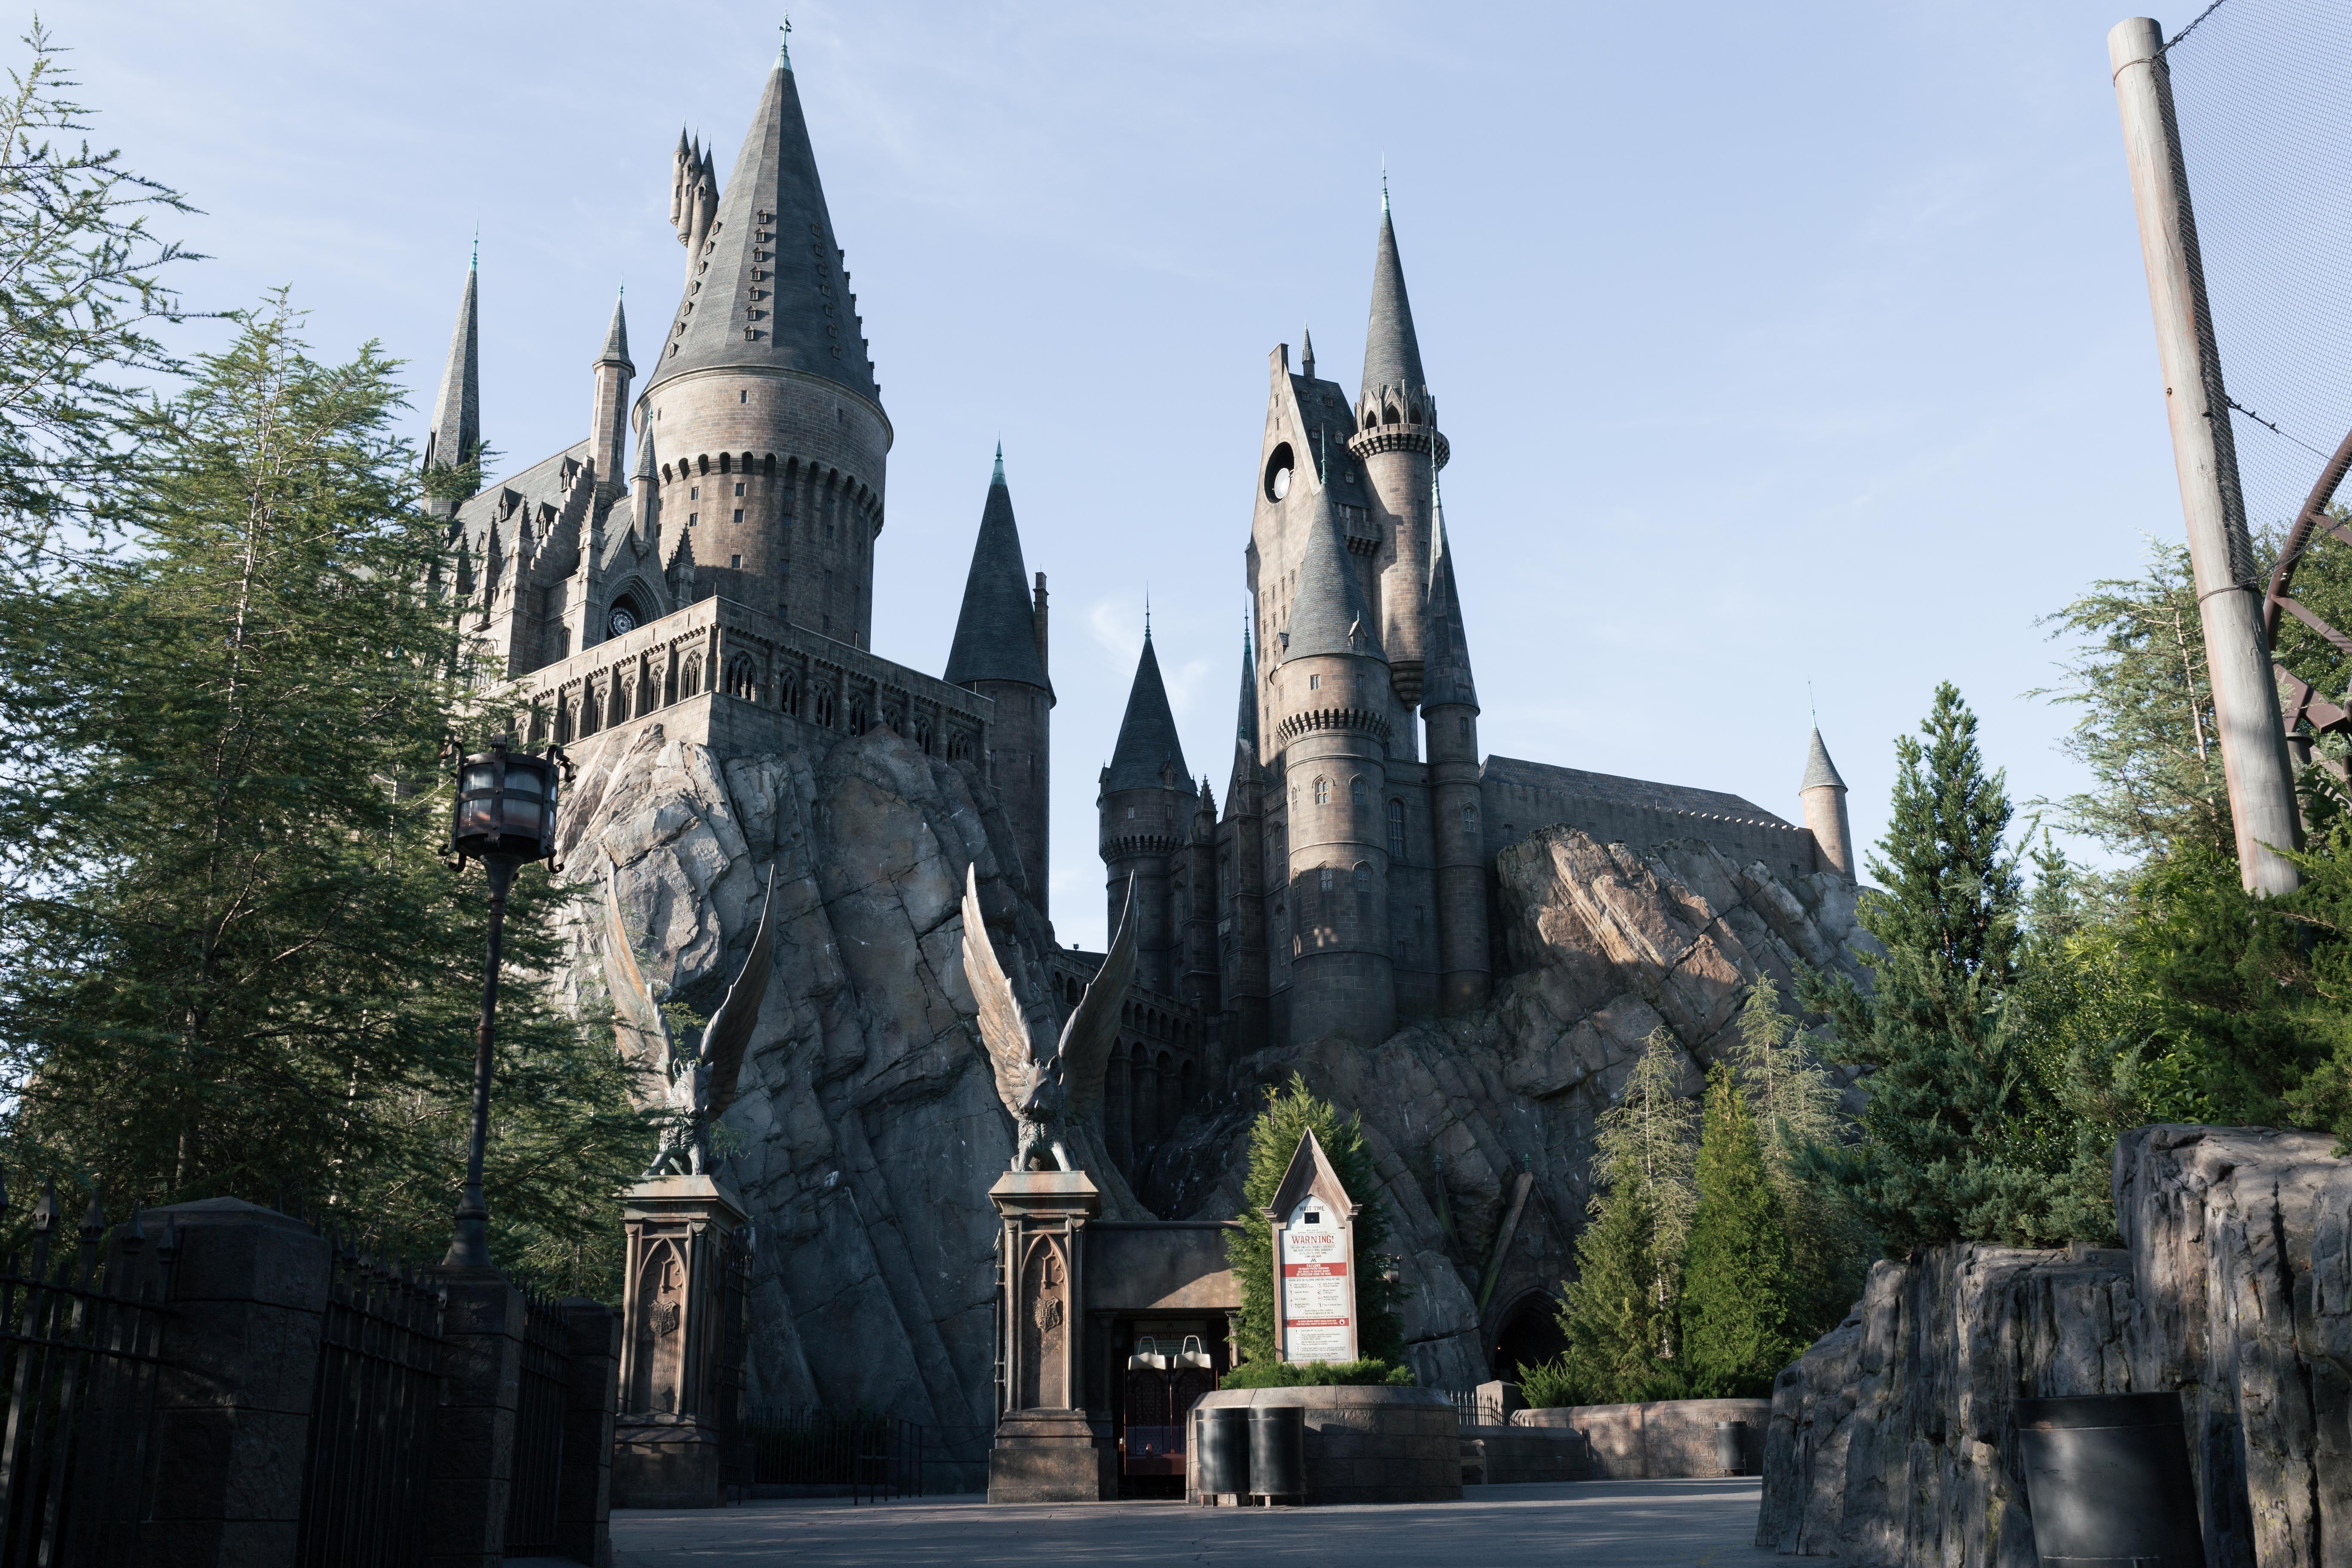 The Wizarding World of Harry Potter Hogwarts